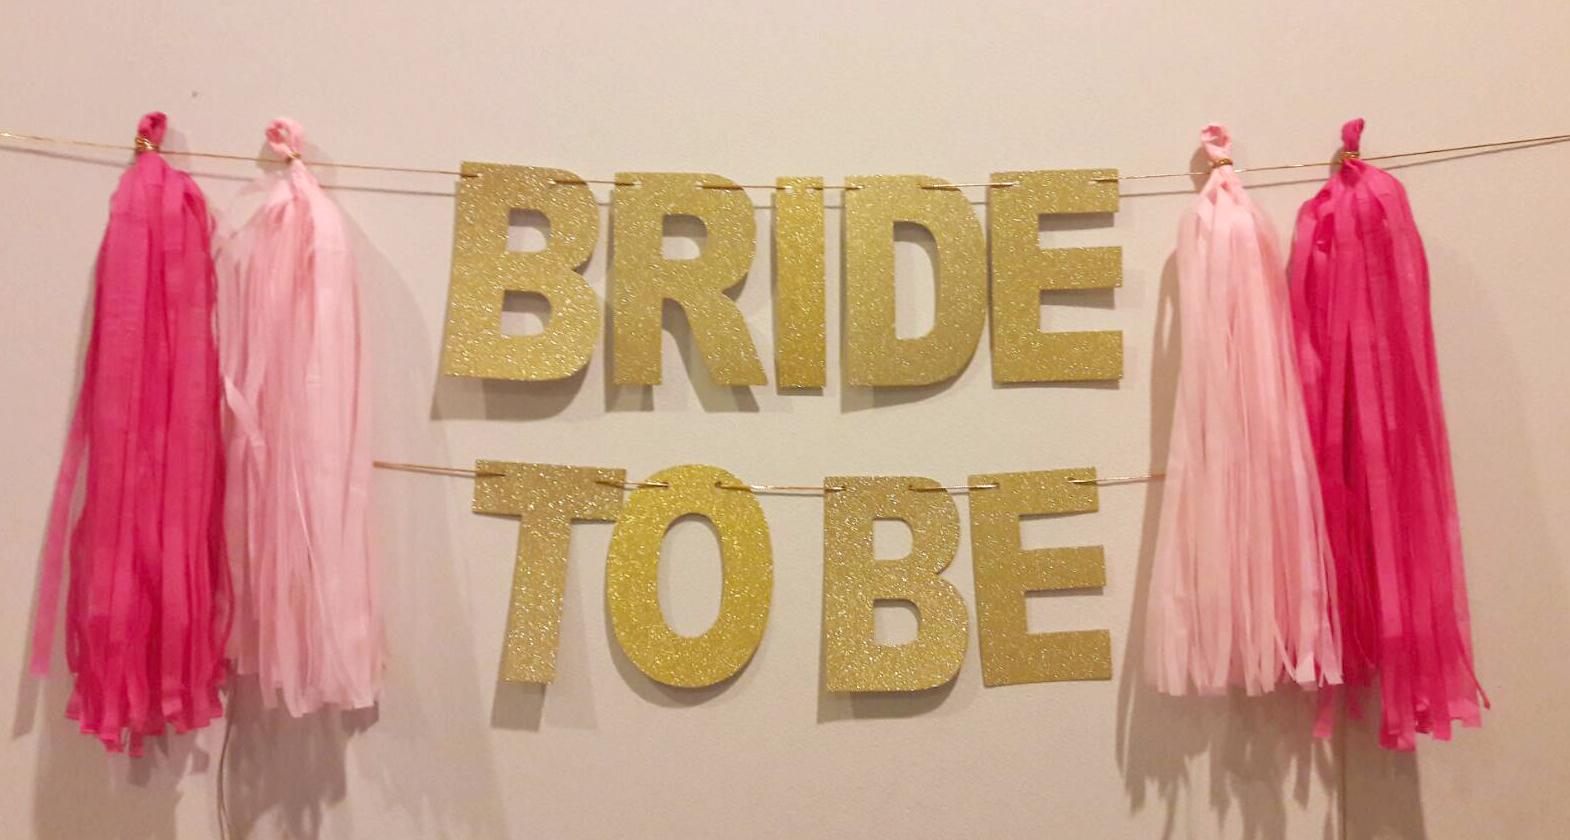 BRIDE TO BE Backdrop 3